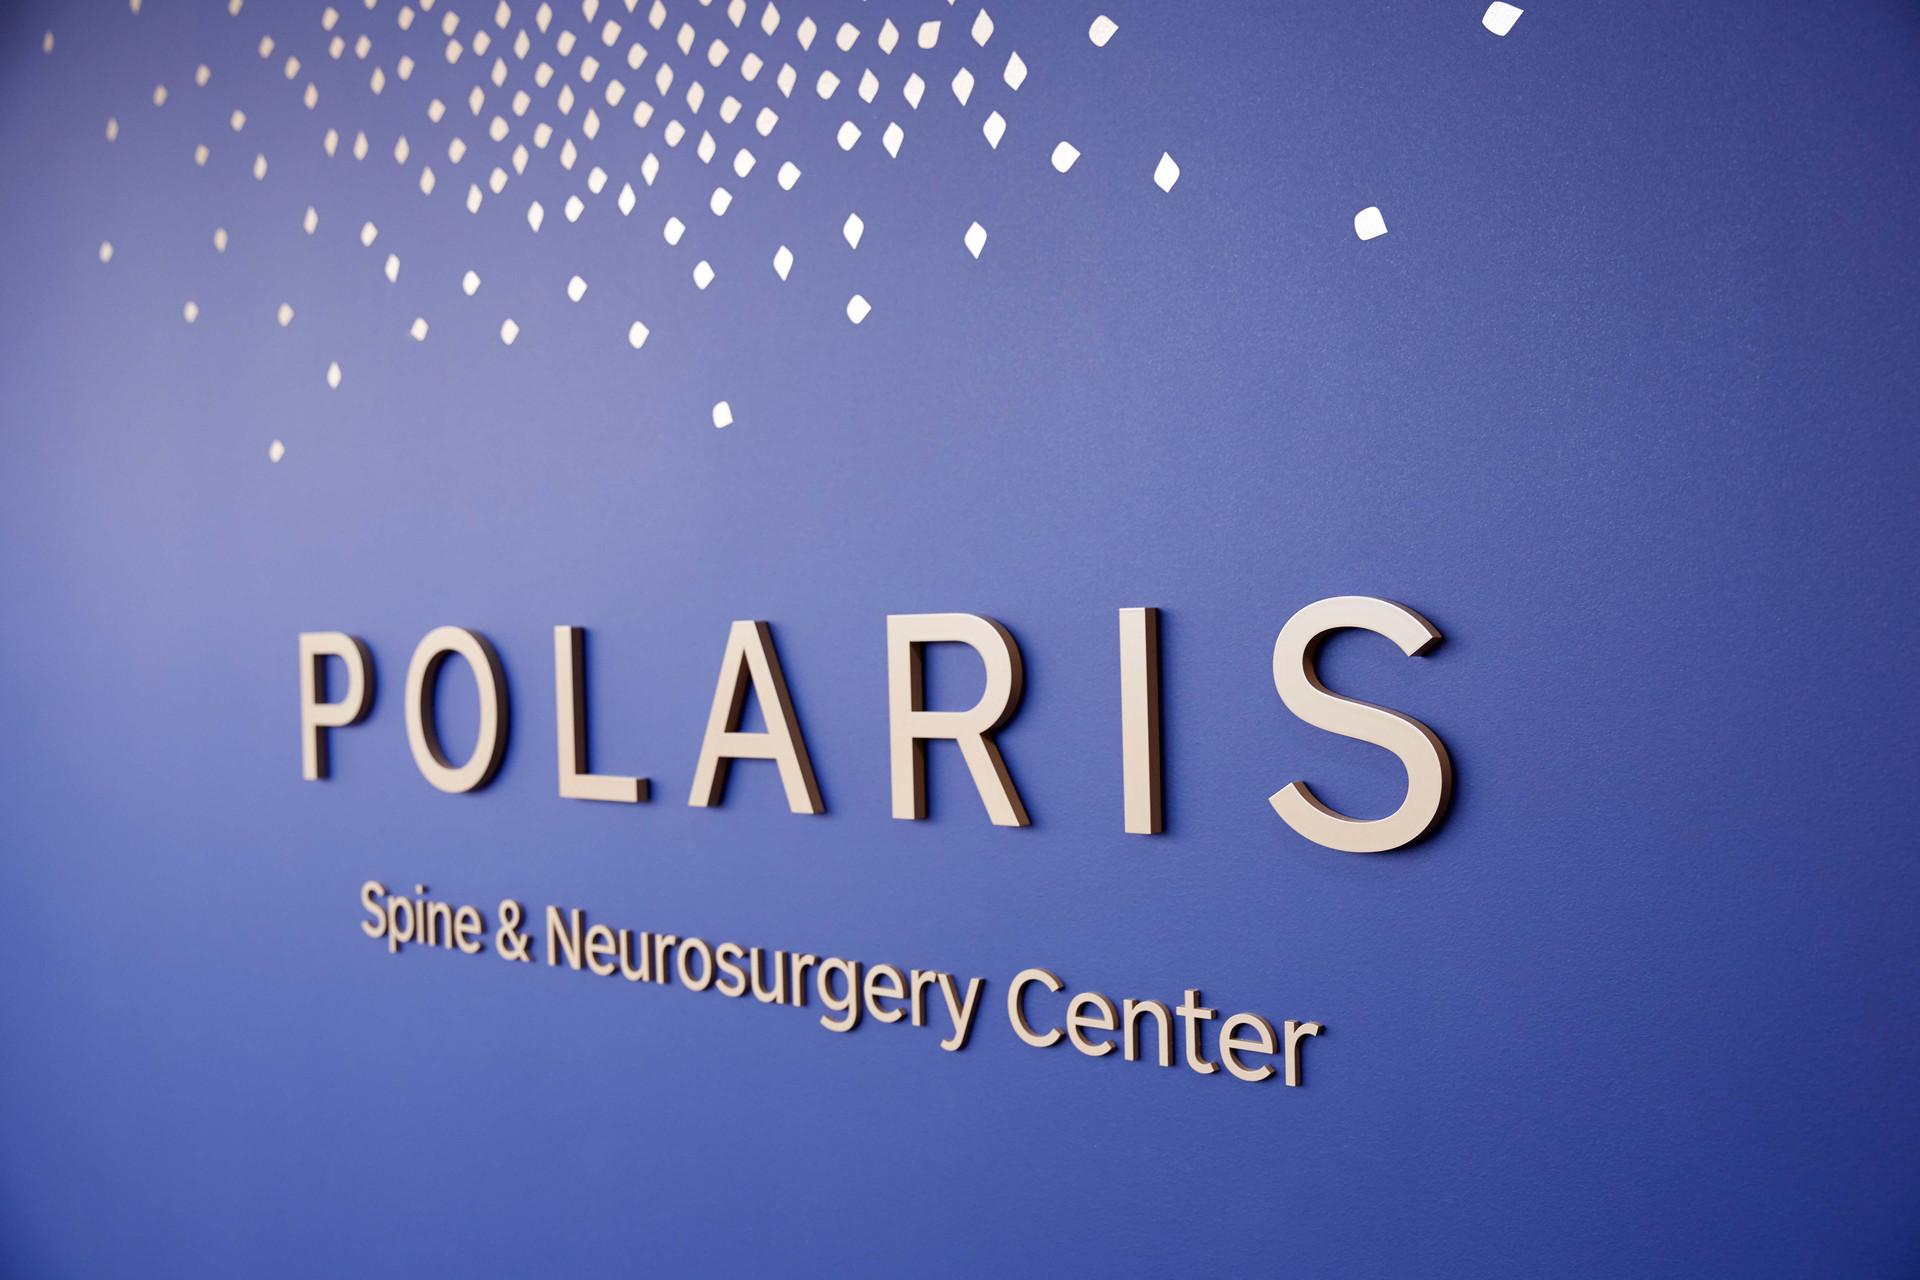 polaris-signs-01.jpg